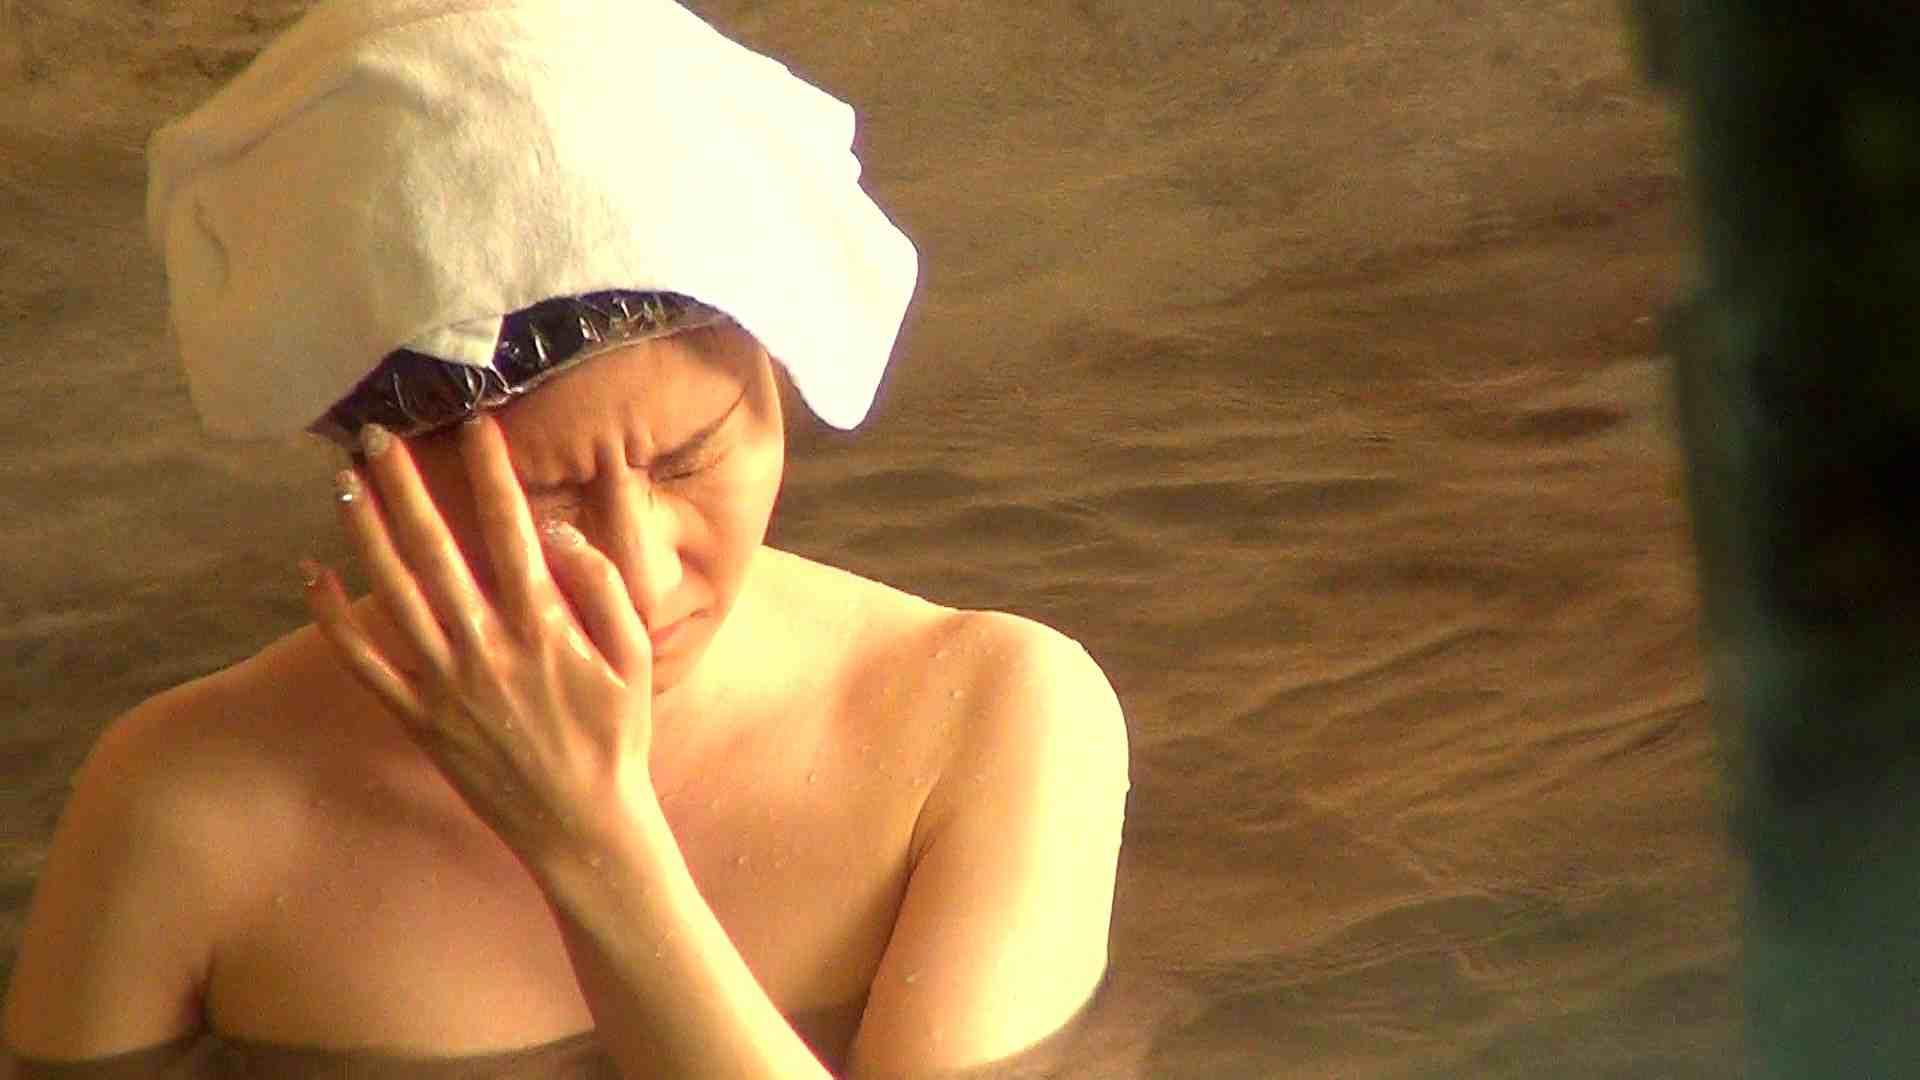 Vol.48 眉間にしわをよせた美人さん 裸体 オメコ動画キャプチャ 101連発 39